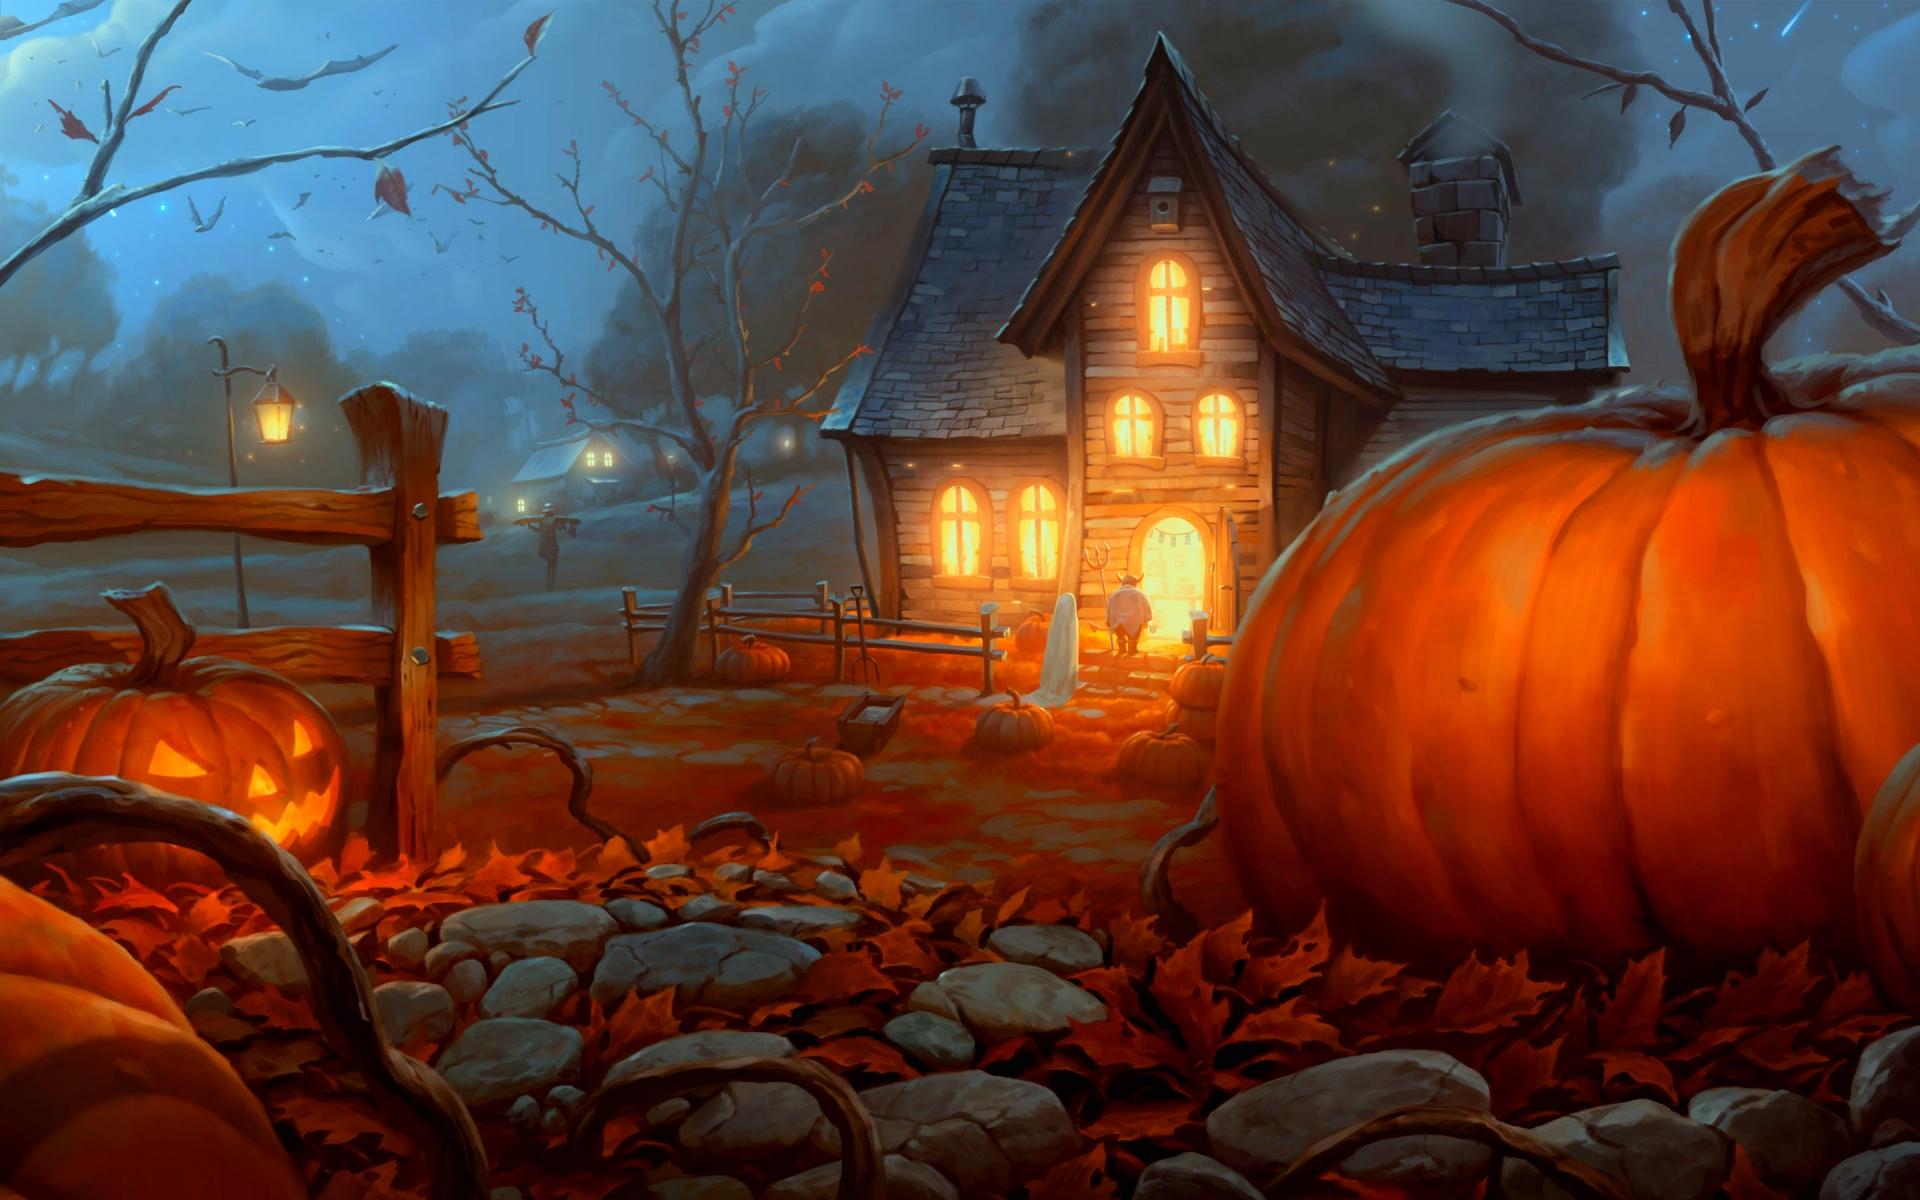 60] Beautiful Halloween Desktop Wallpaper on WallpaperSafari 1920x1200